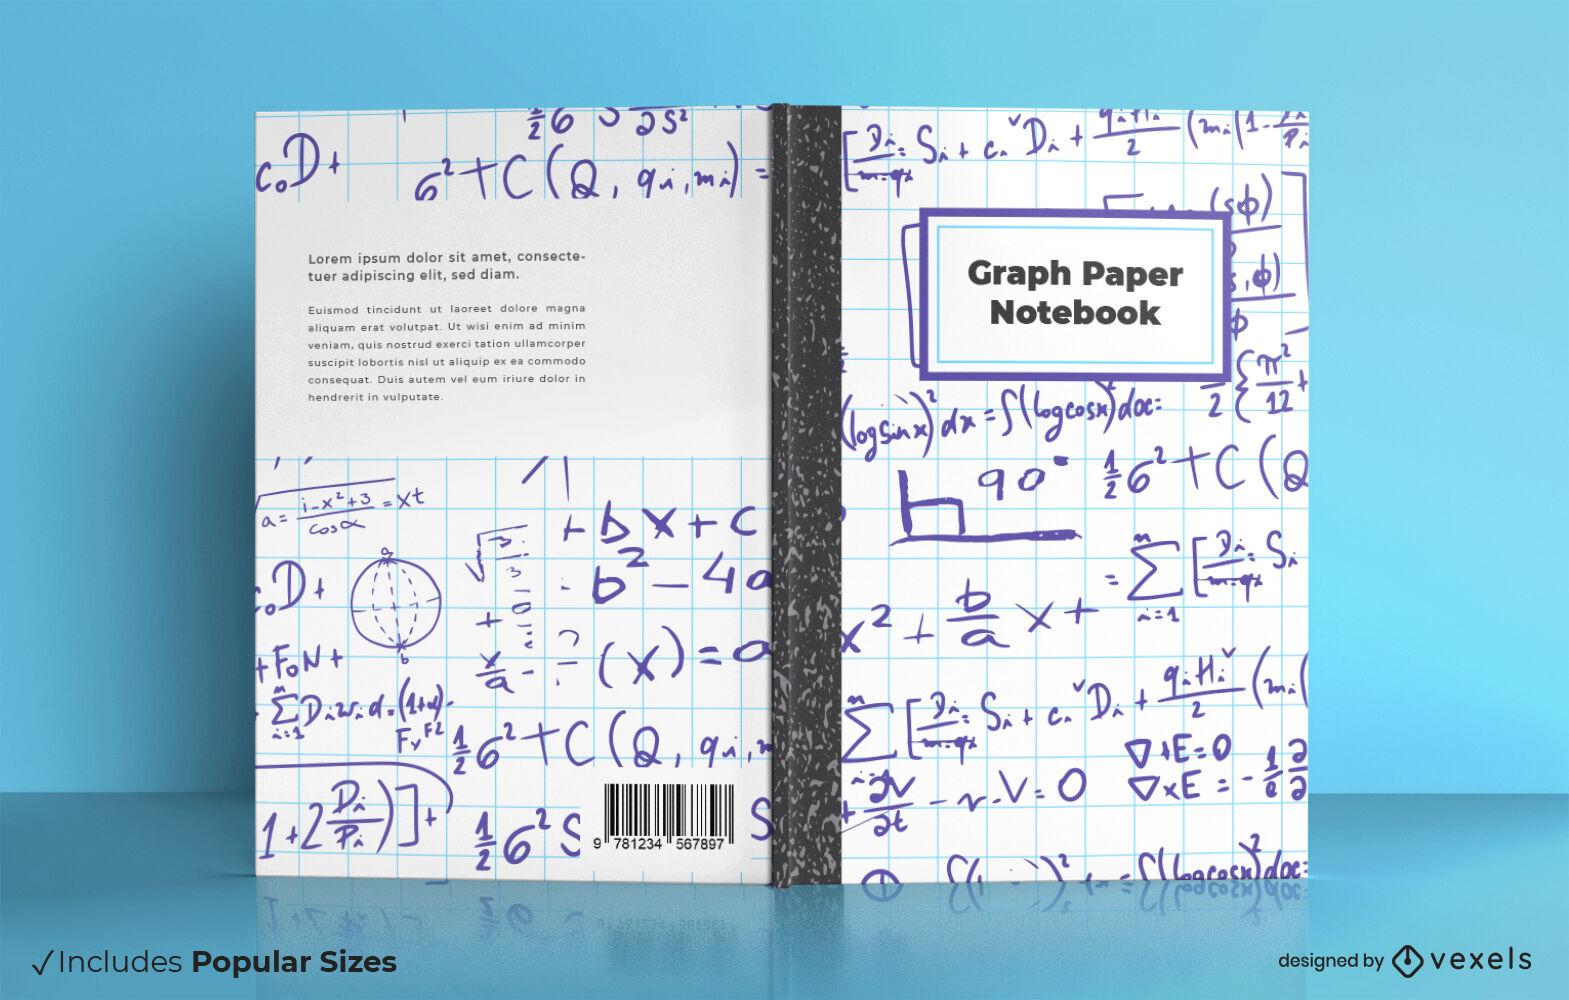 Cool graph paper book cover design